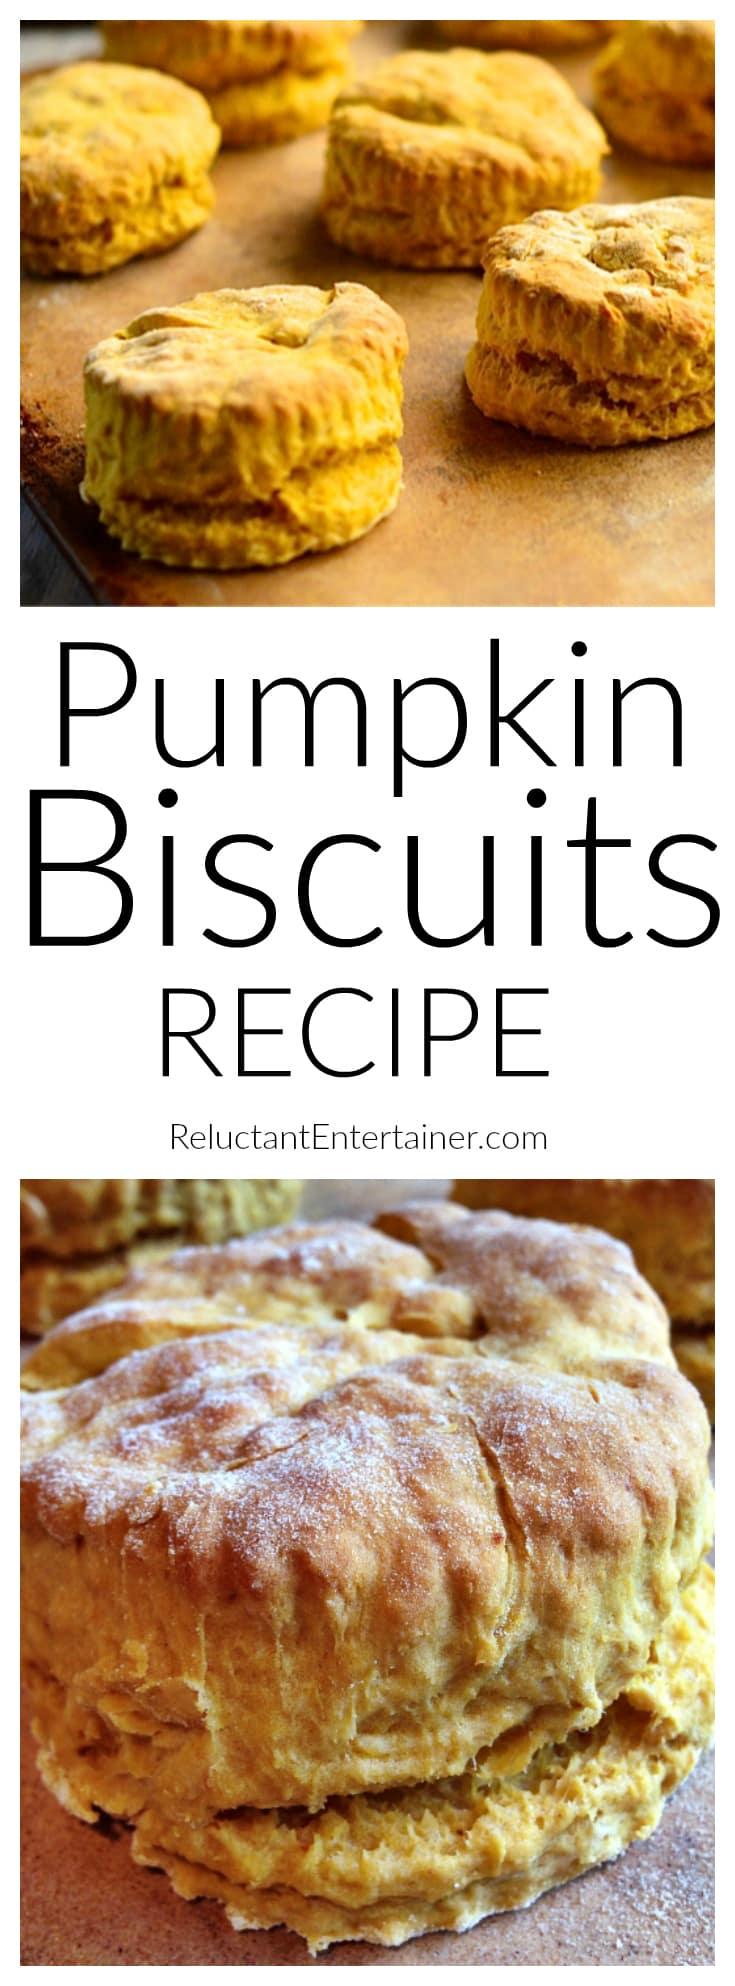 Pumpkin Biscuits at ReluctantEntertainer.com